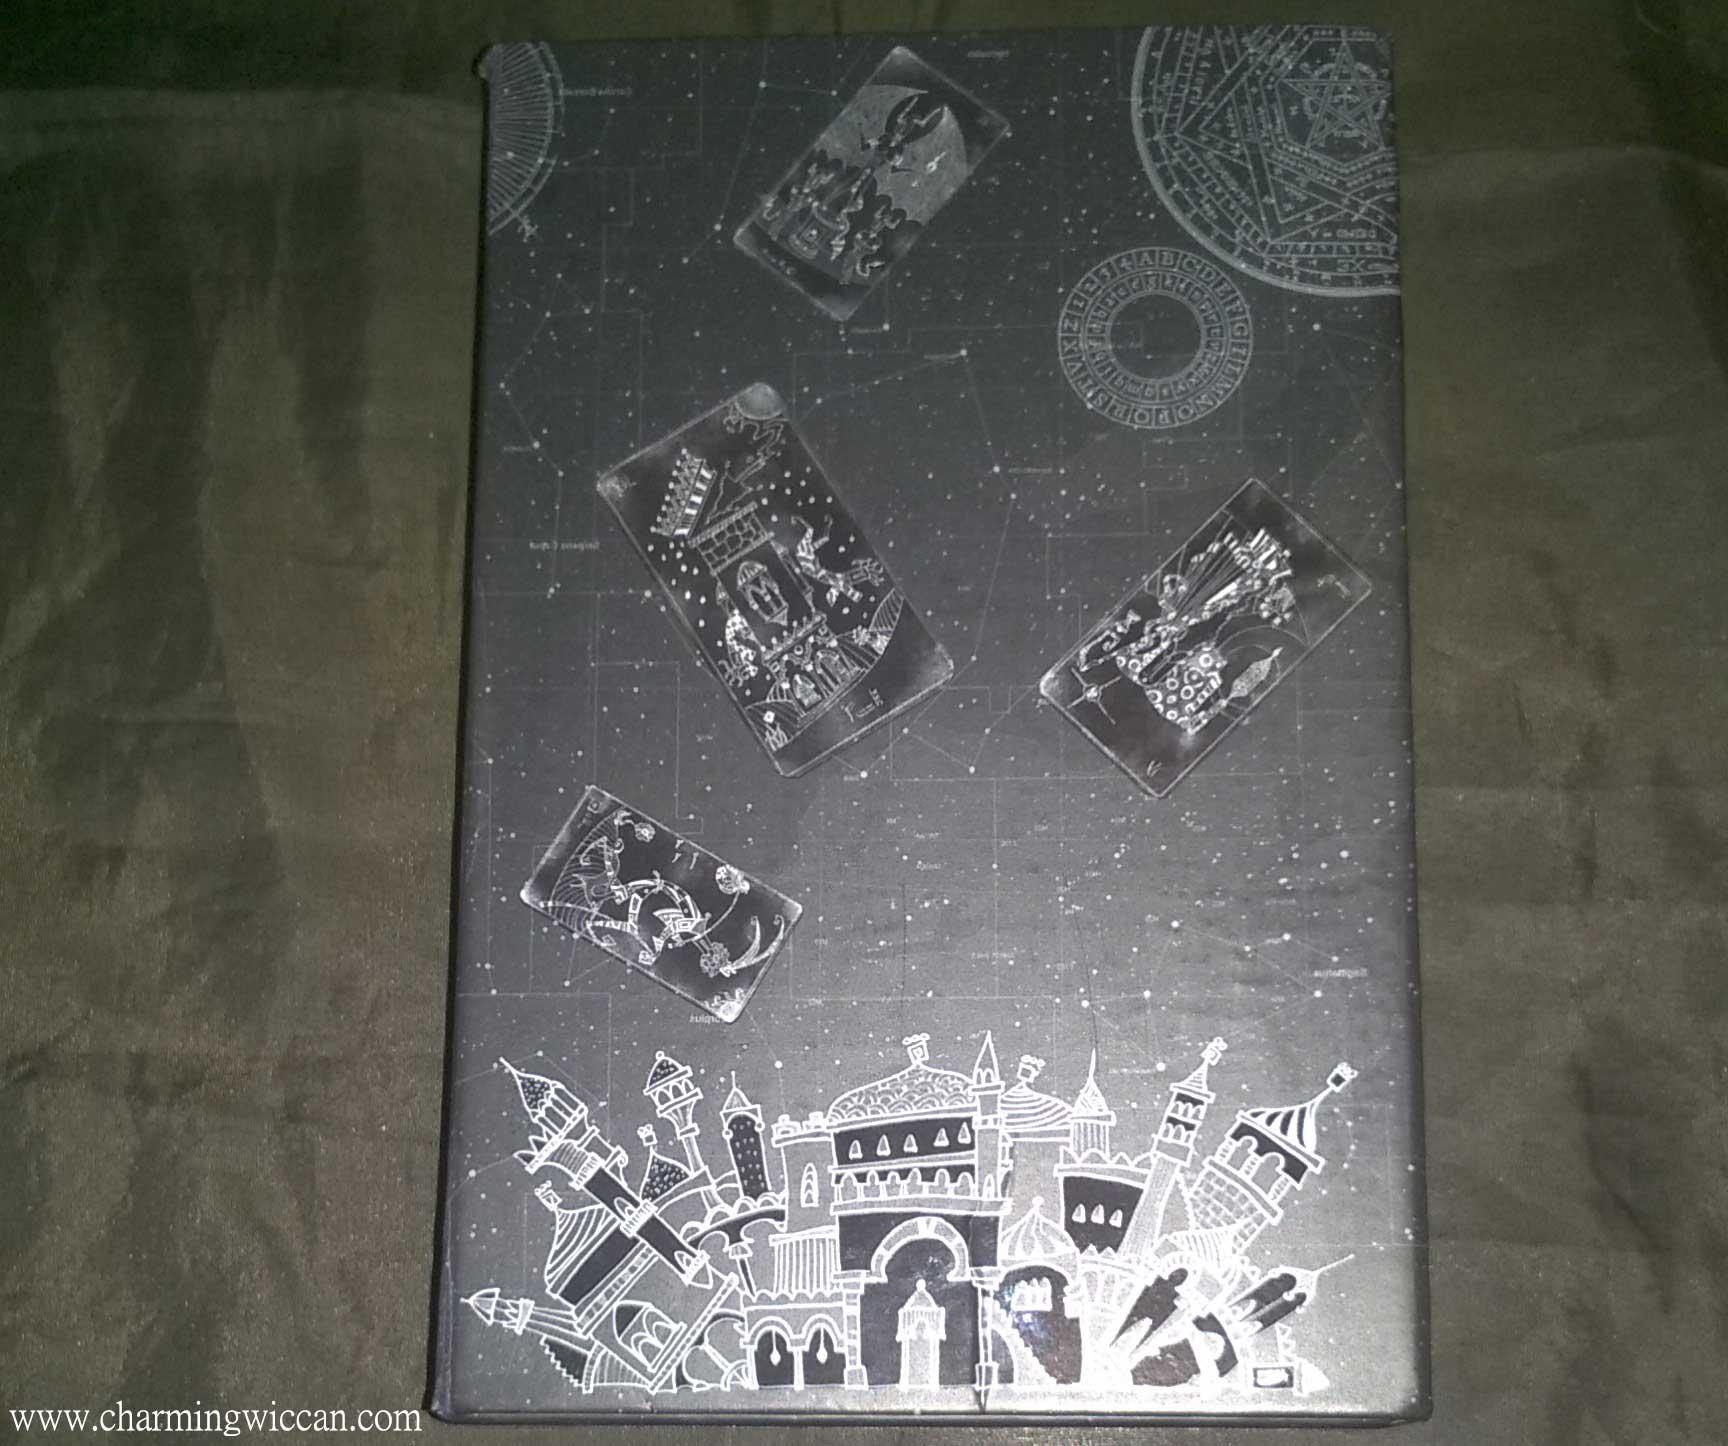 caixa the lost code of tarot